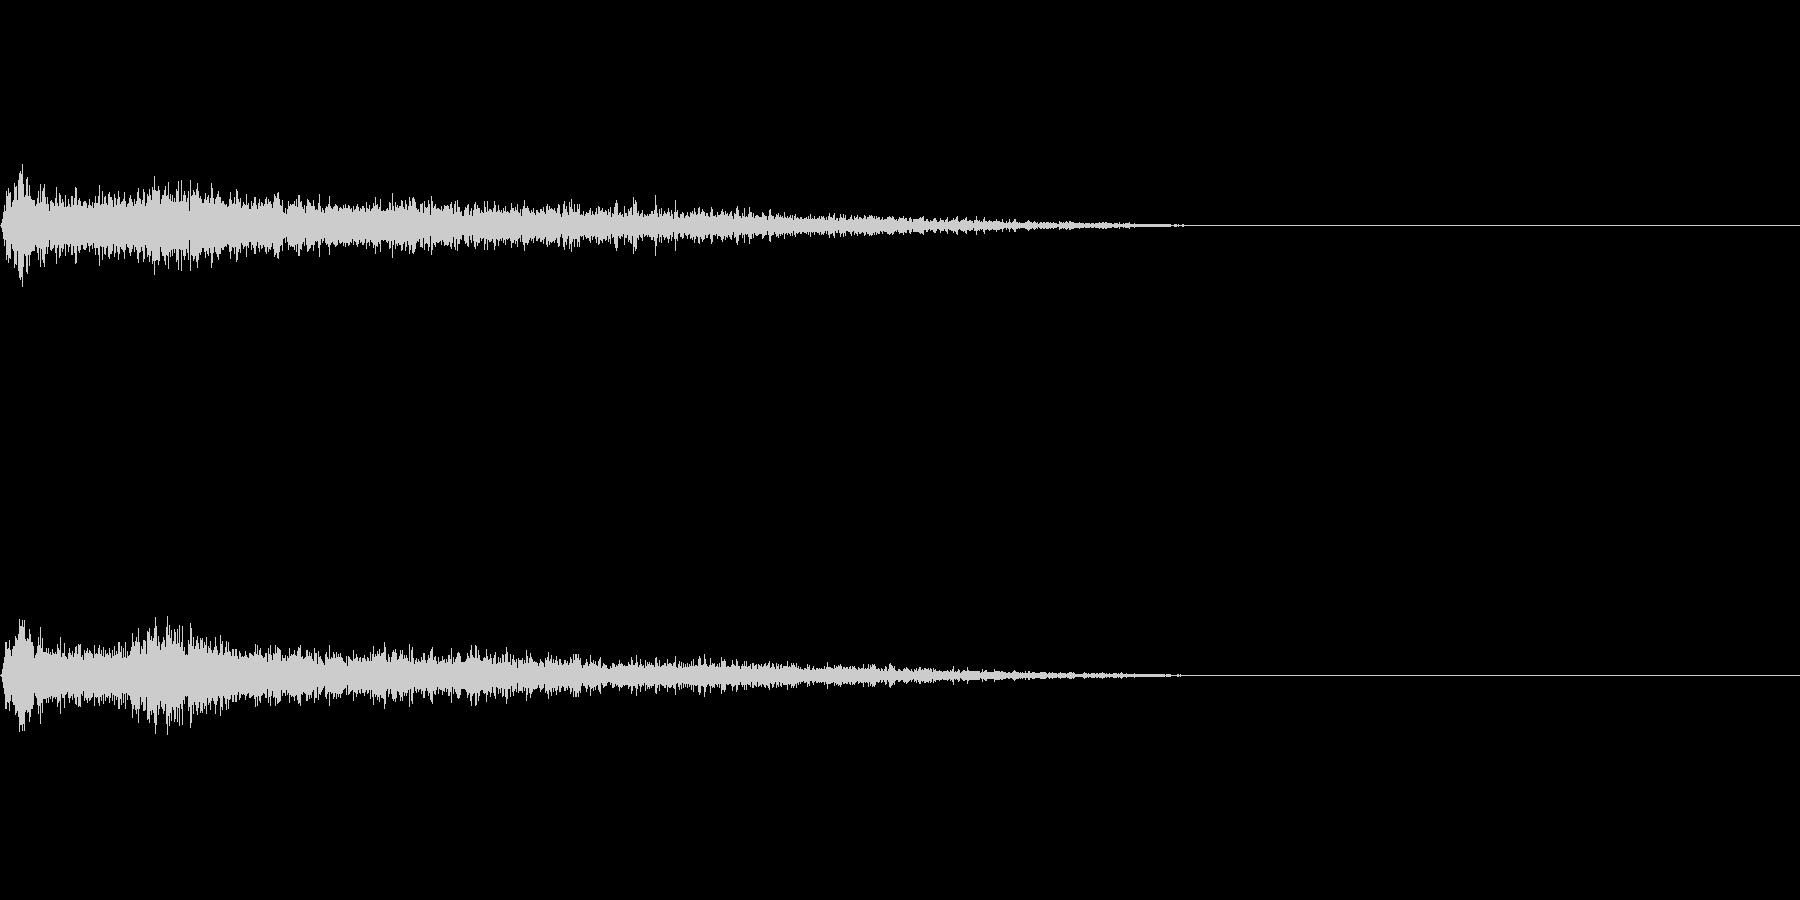 Bメジャー インパクト音 衝撃音の未再生の波形